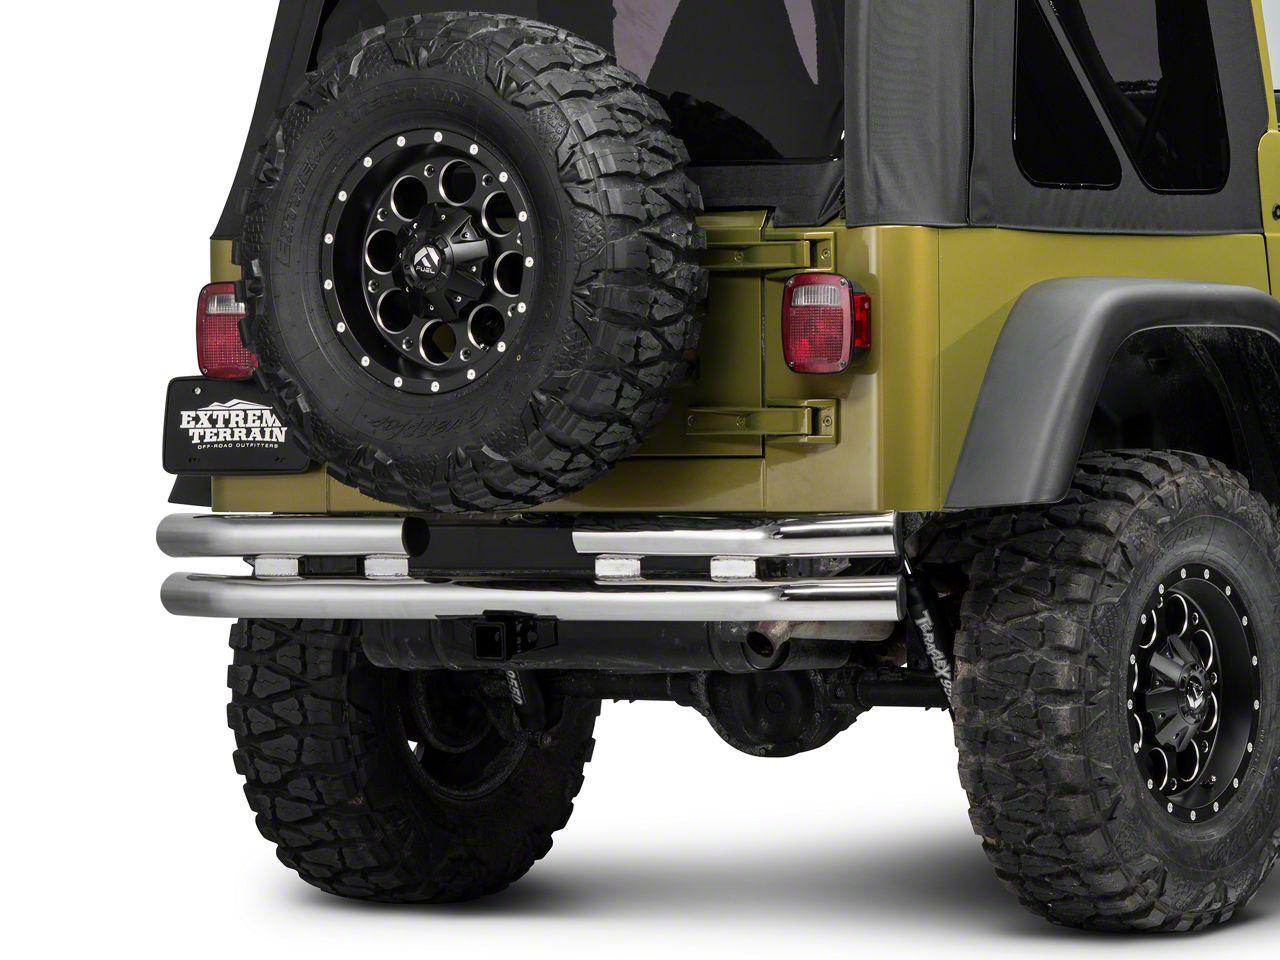 Barricade Double Tubular Rear Bumper w/ Receiver Hitch - Polished (87-06 Jeep Wrangler YJ & TJ)